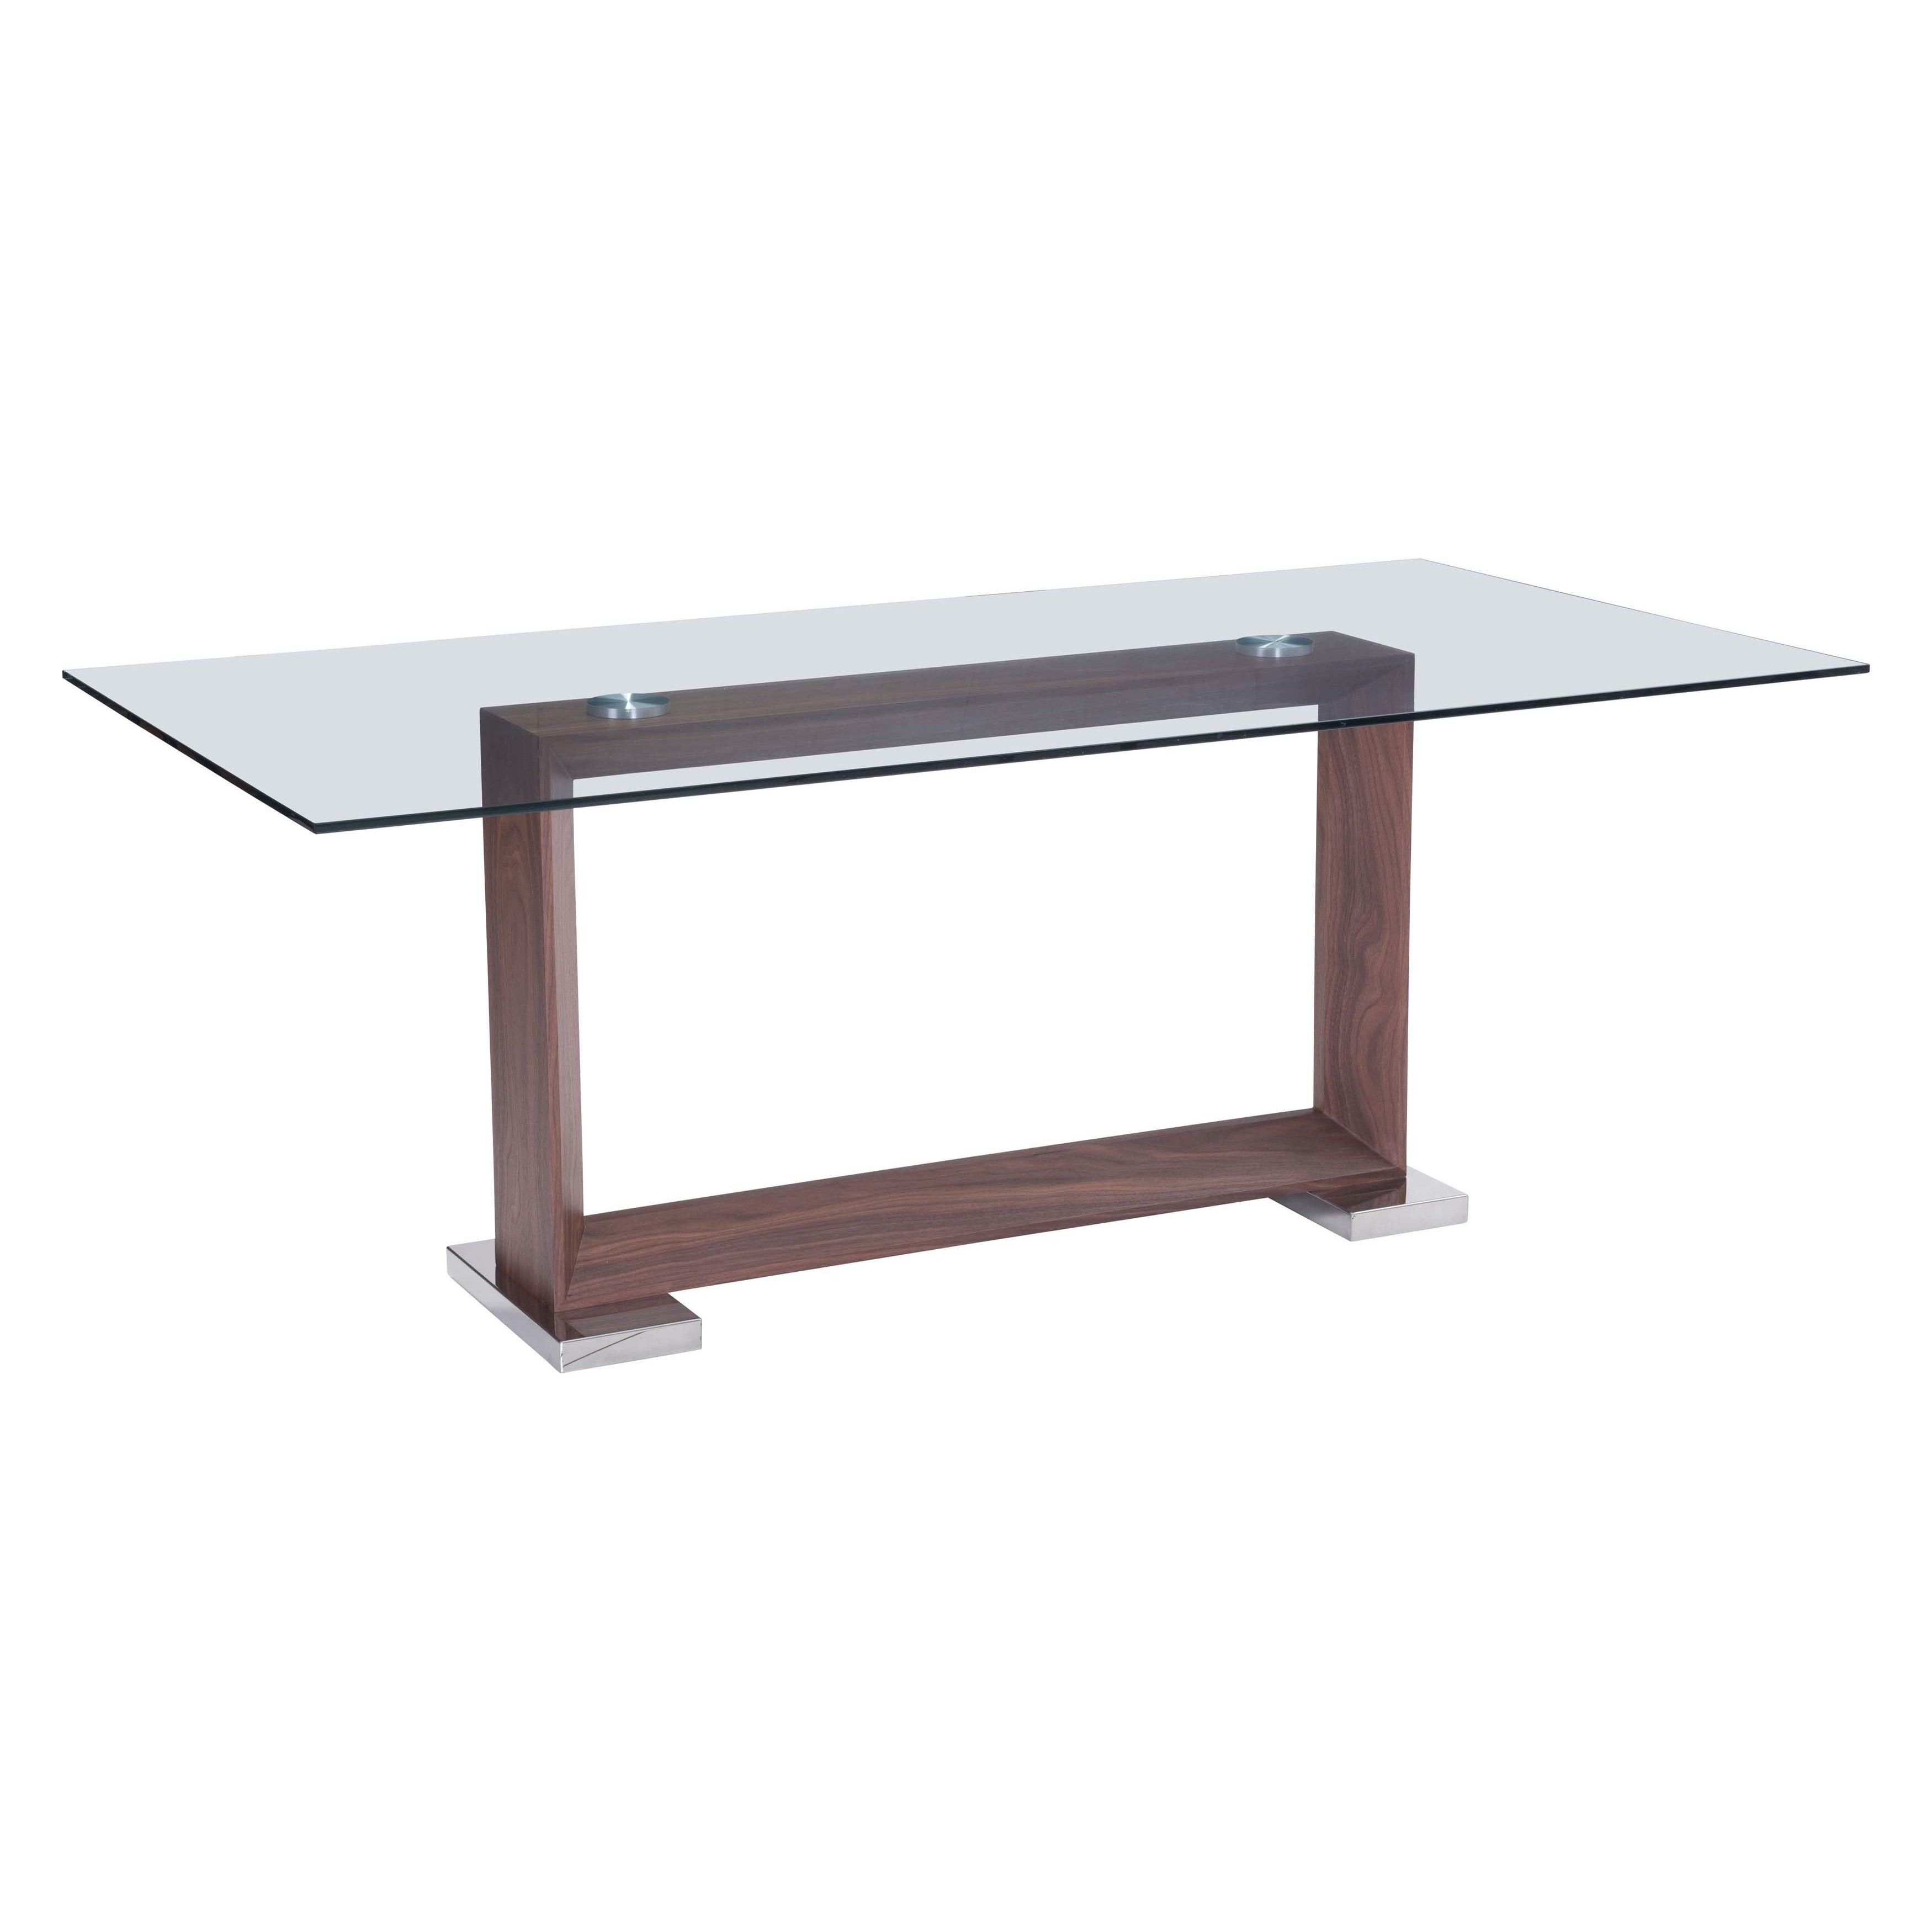 oasis rectangular walnut finish glass top dining table overstock